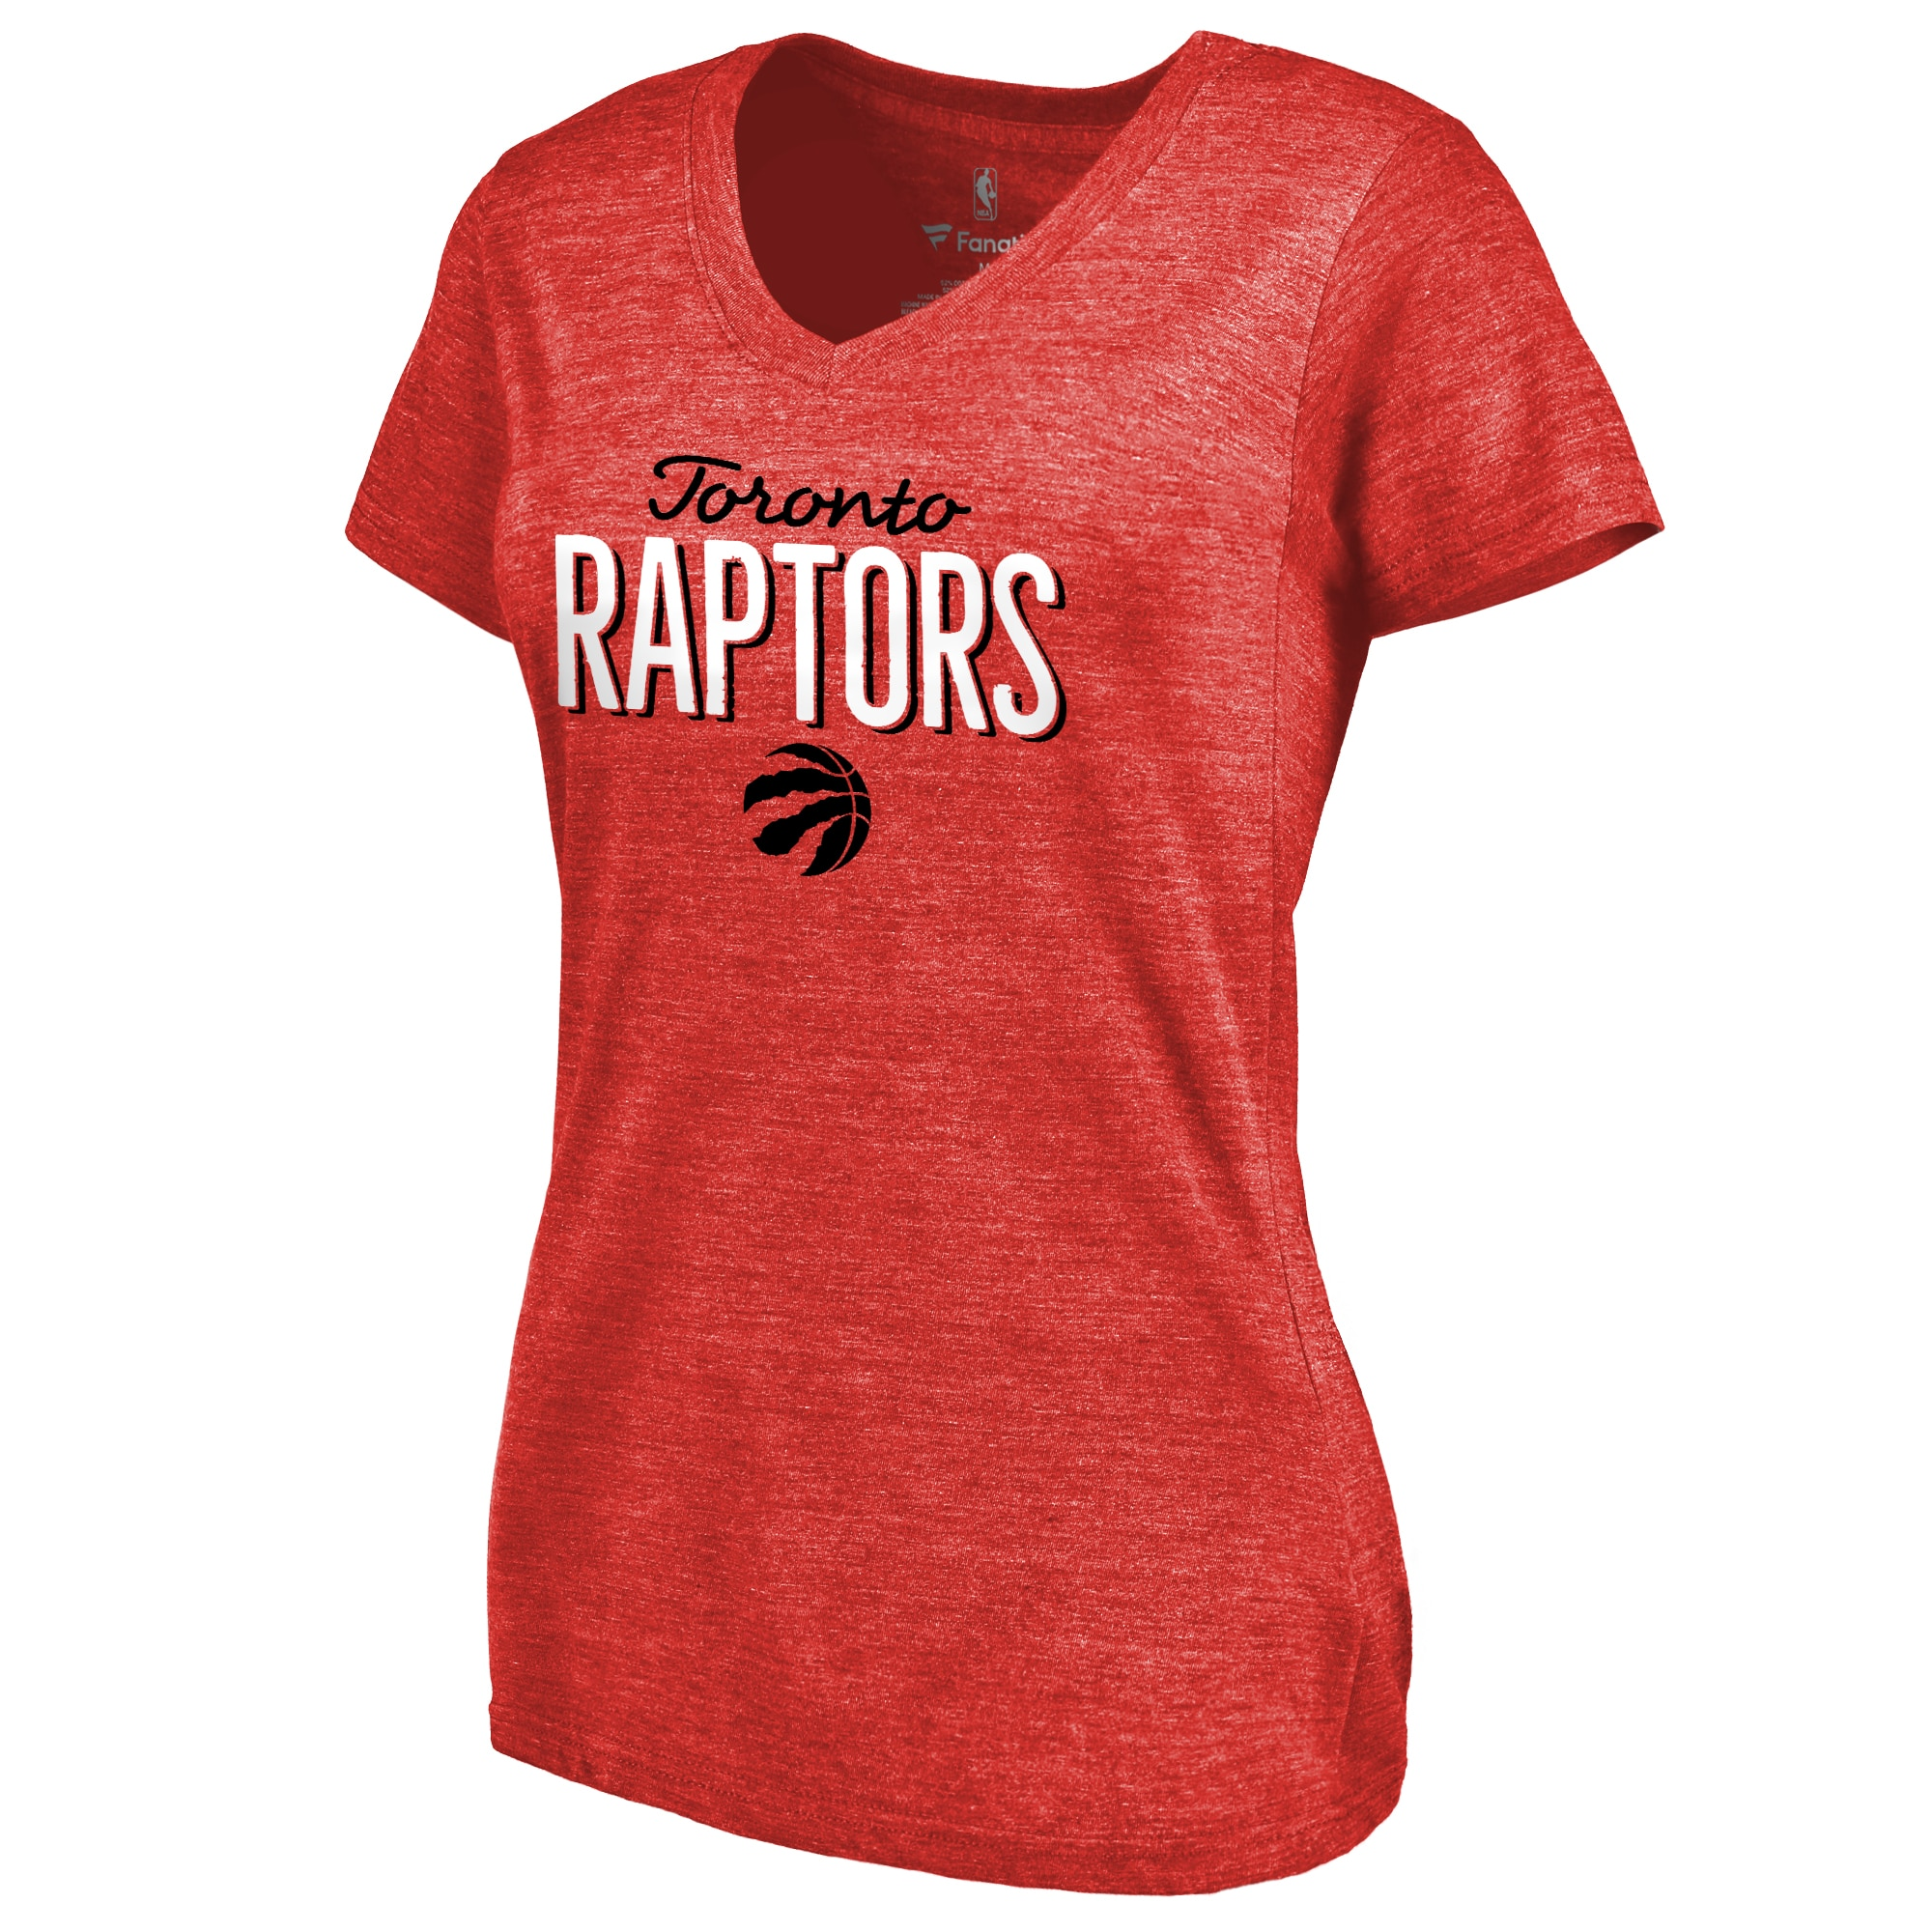 Toronto Raptors Women's Nostalgia Tri-Blend V-Neck T-Shirt - Red